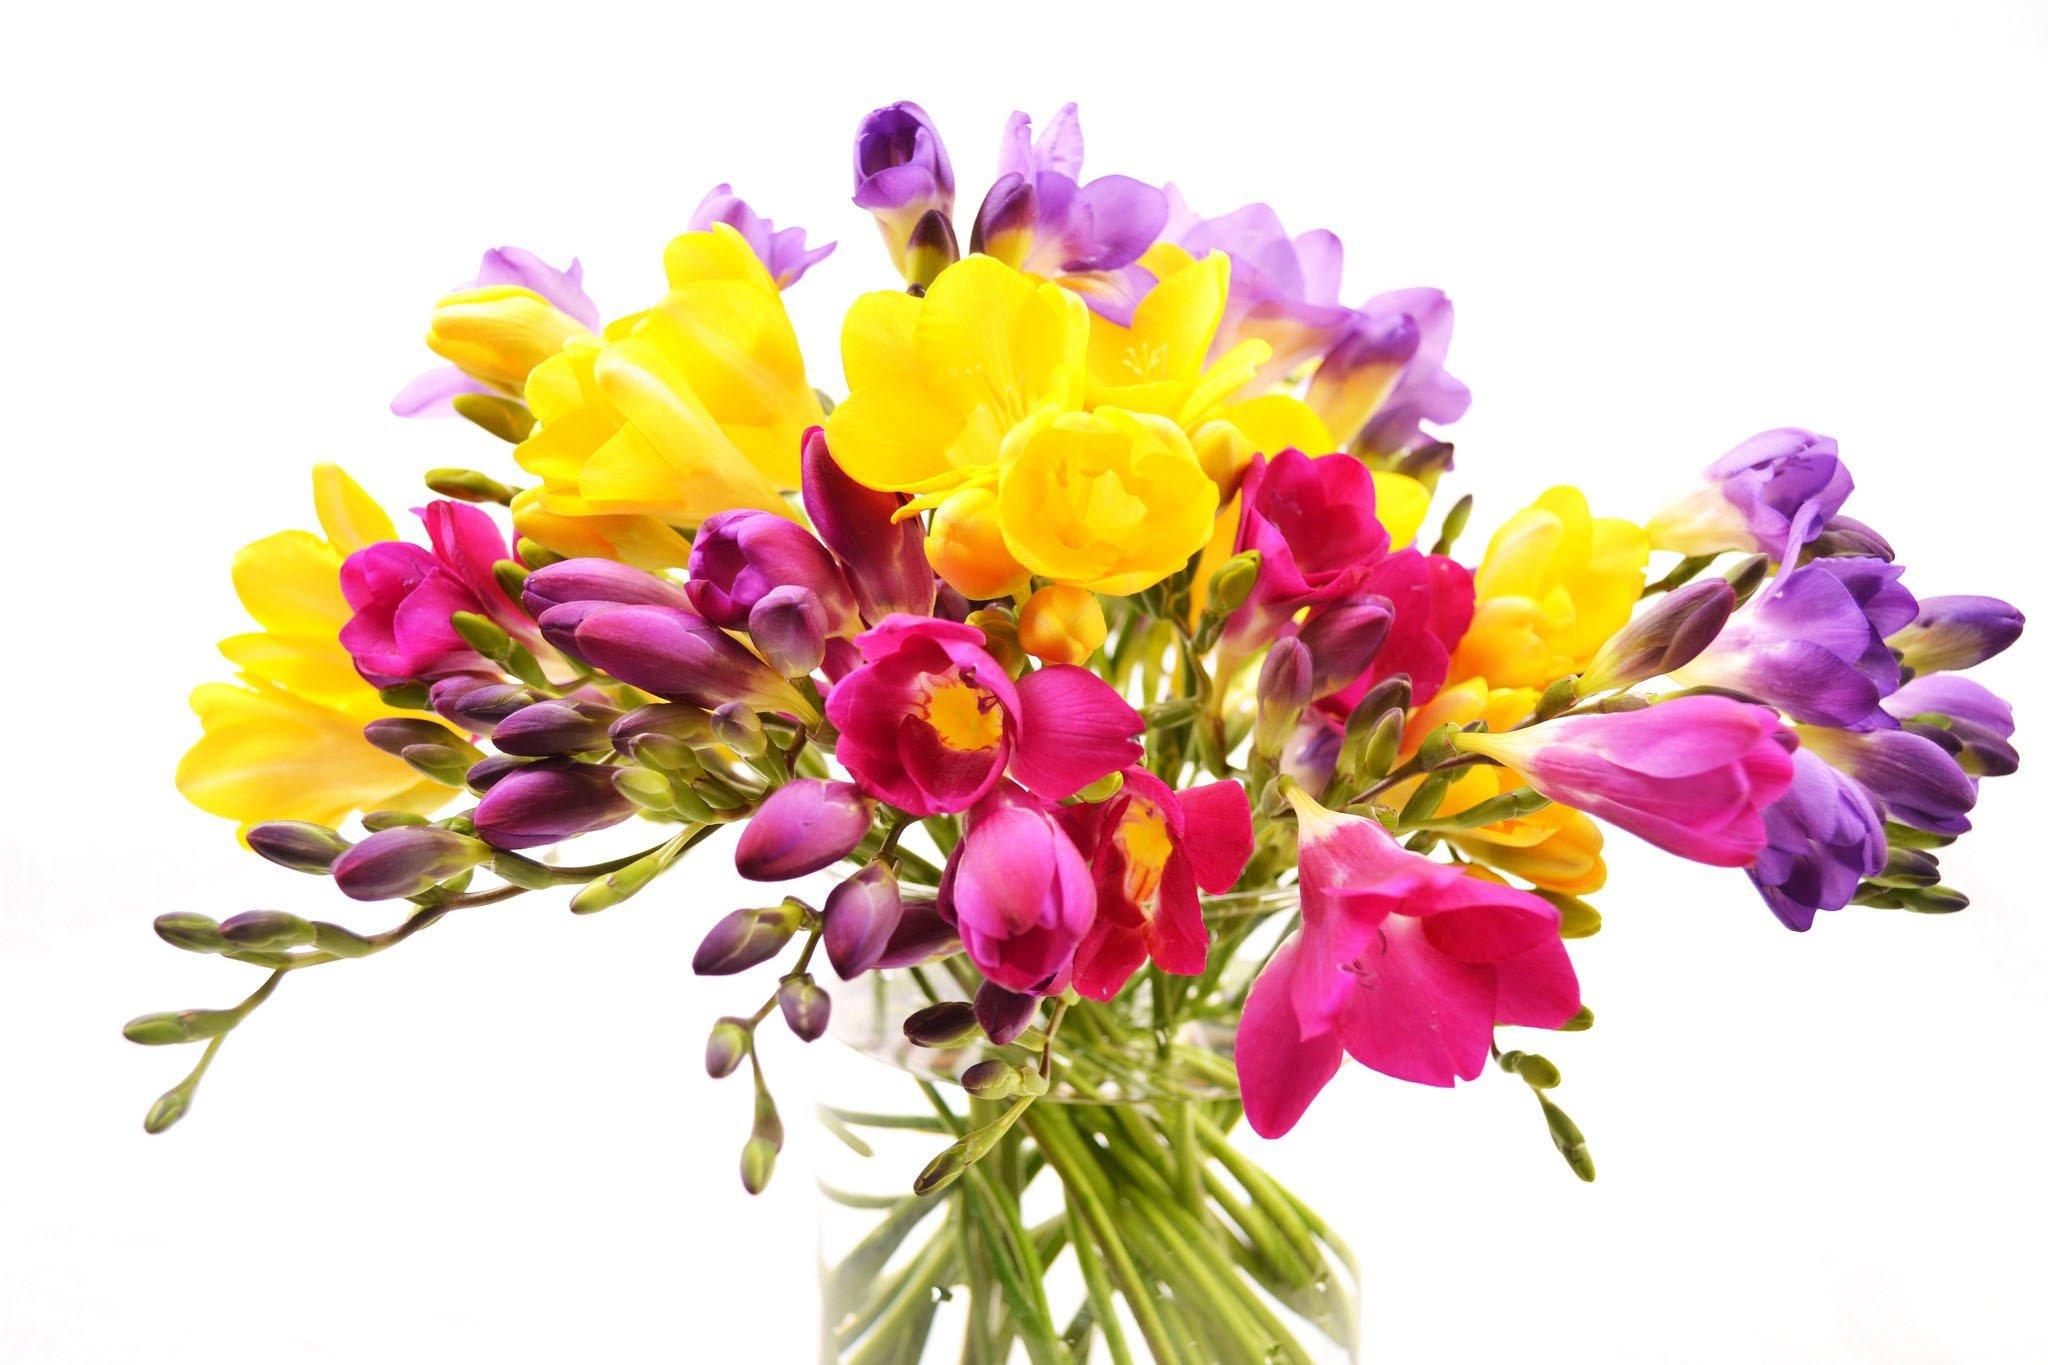 Flowers bouquet vase freesia white background wallpaper 2048x1365 flowers bouquet vase freesia white background wallpaper 2048x1365 335936 wallpaperup izmirmasajfo